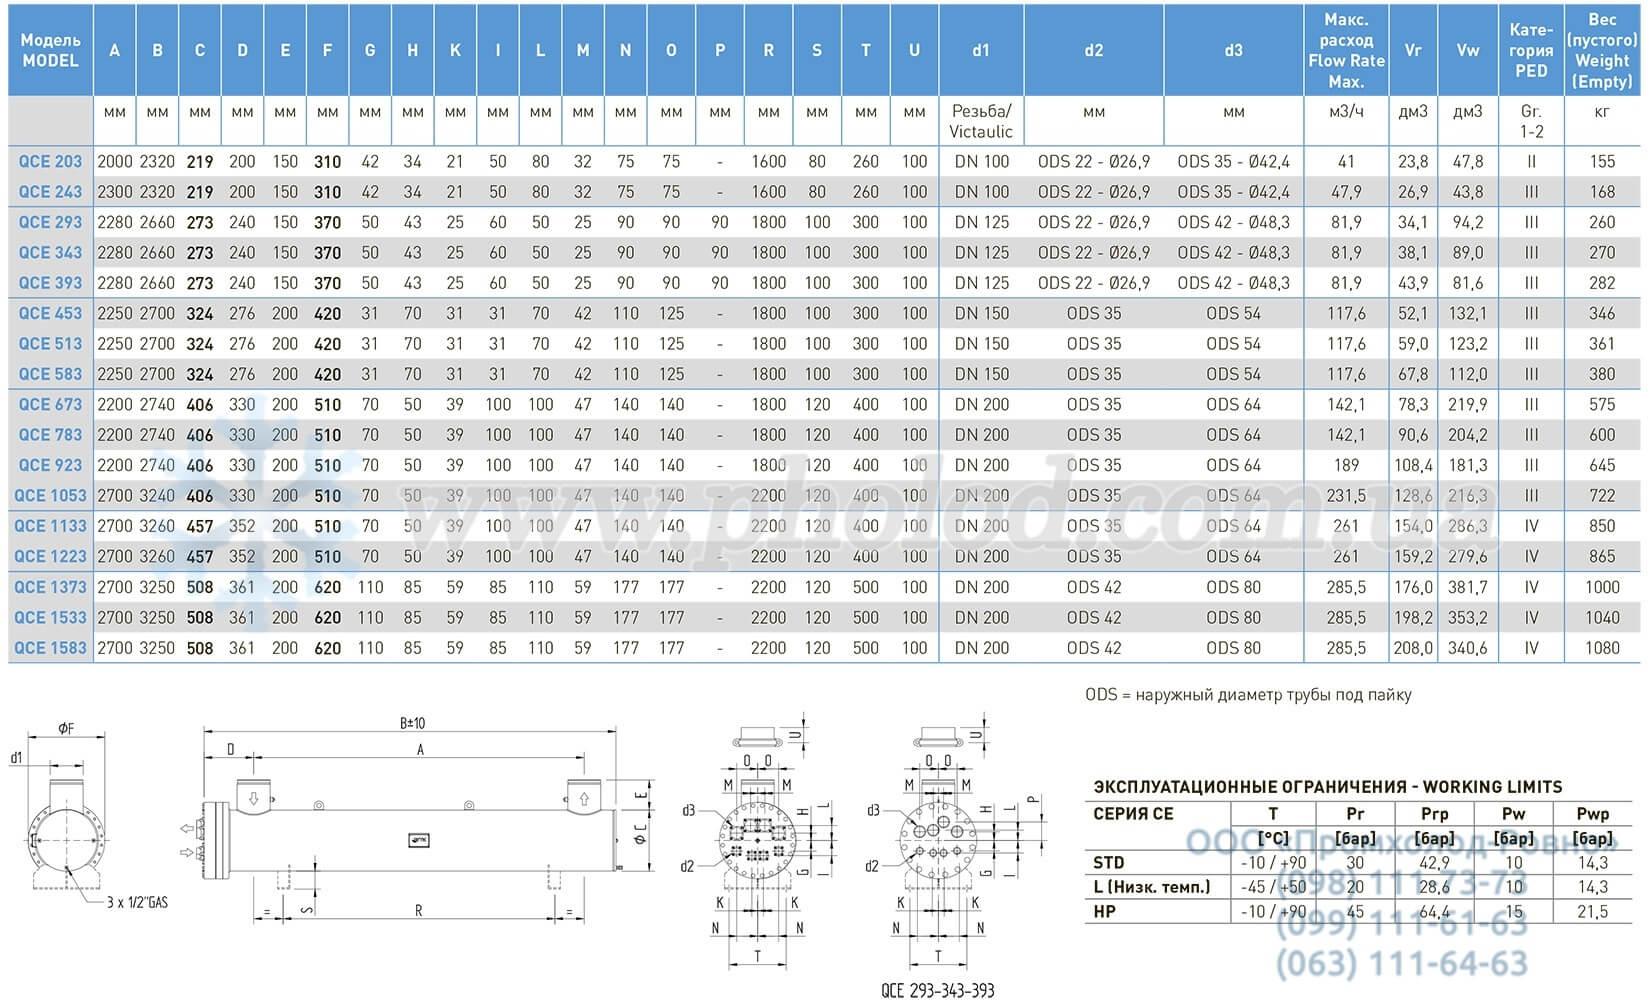 WTK qCE dimensions